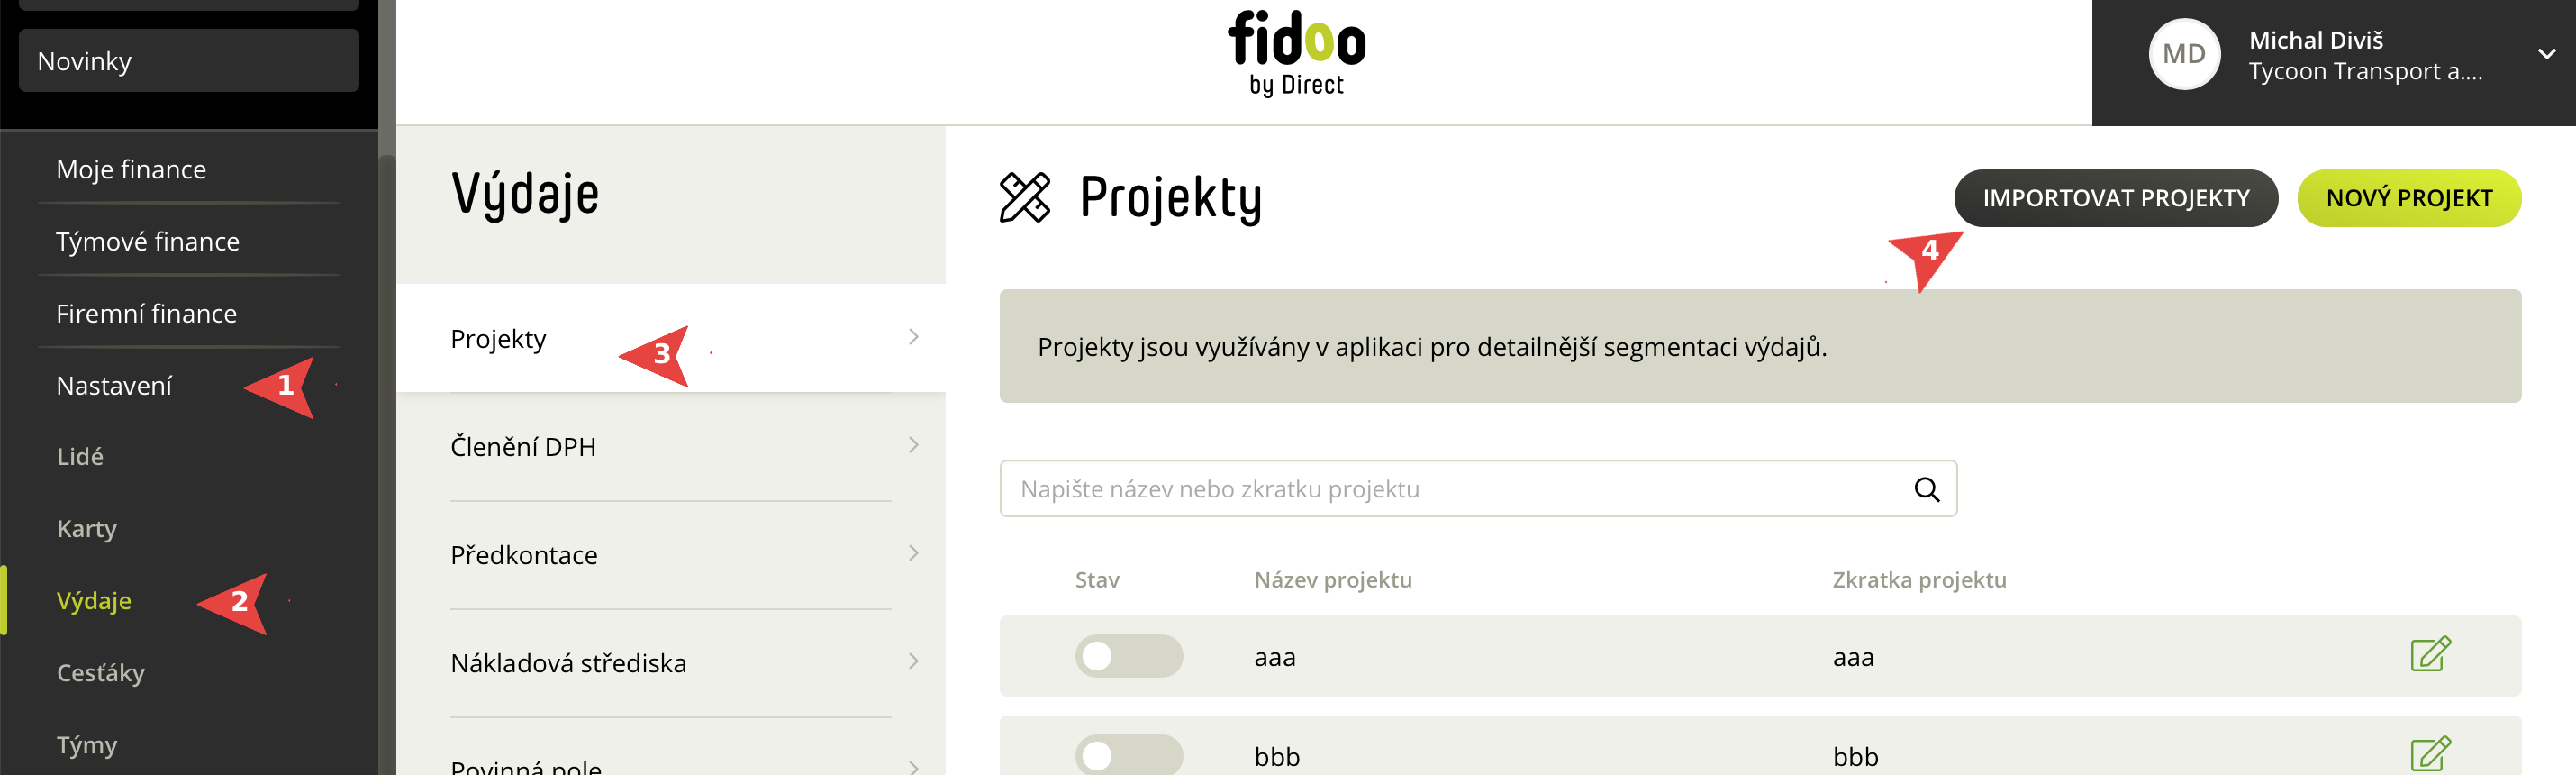 Import projektů ve Fidoo